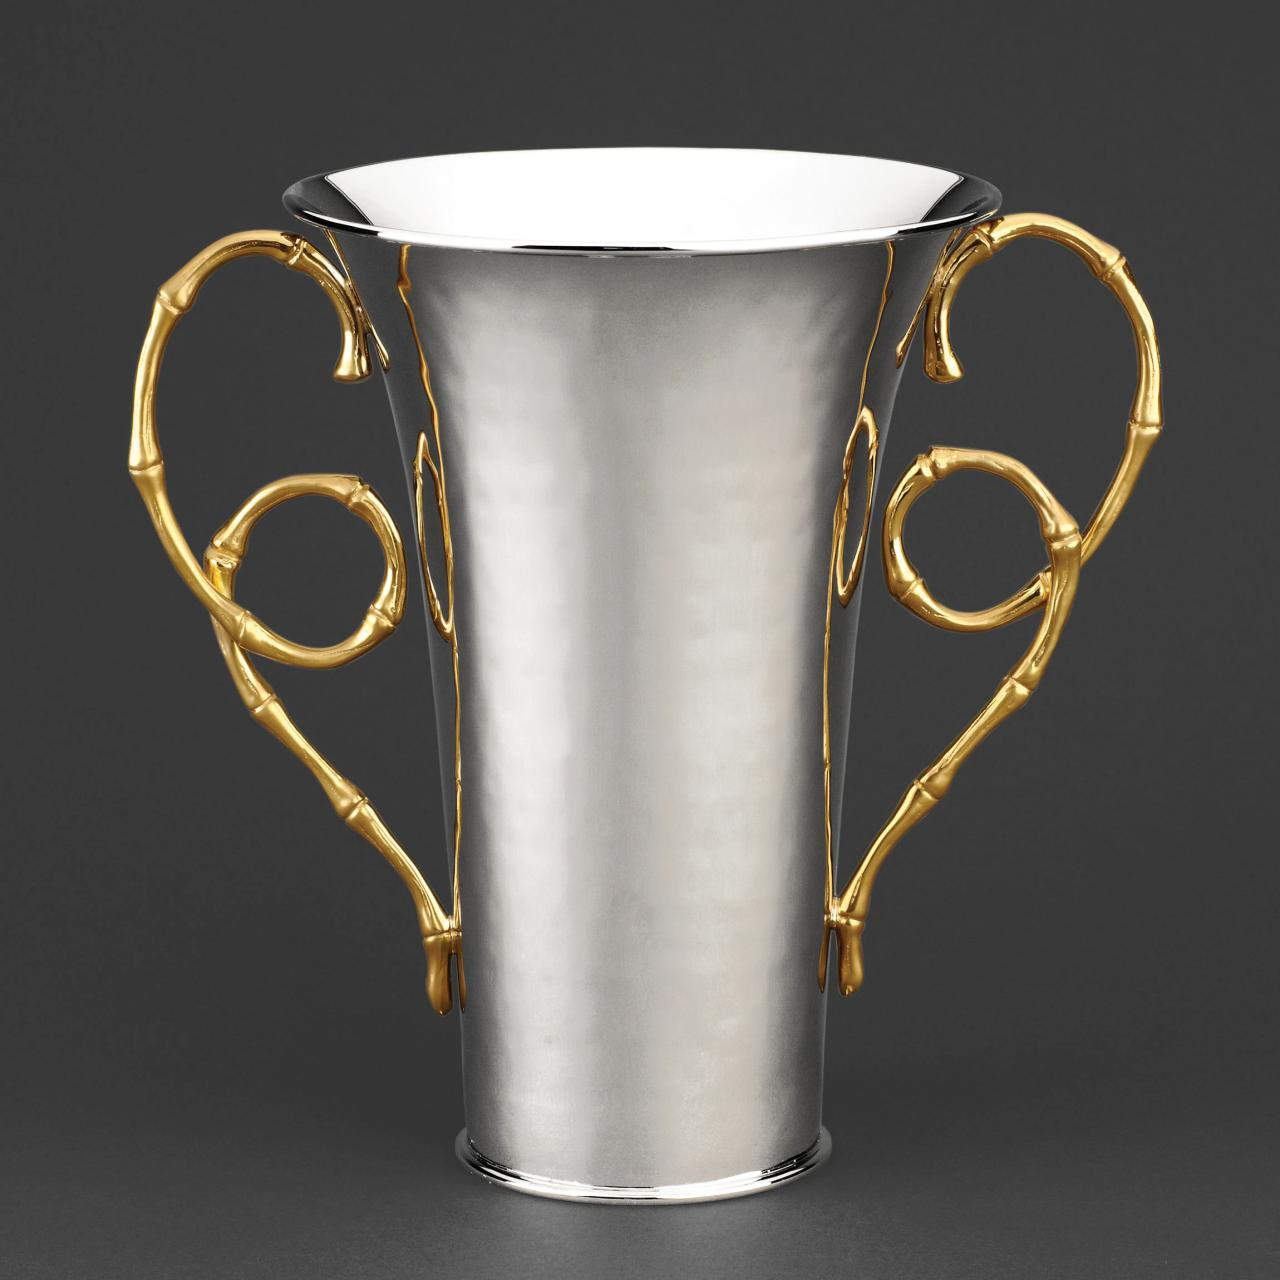 Evoca Vase - Small - - L'OBJET